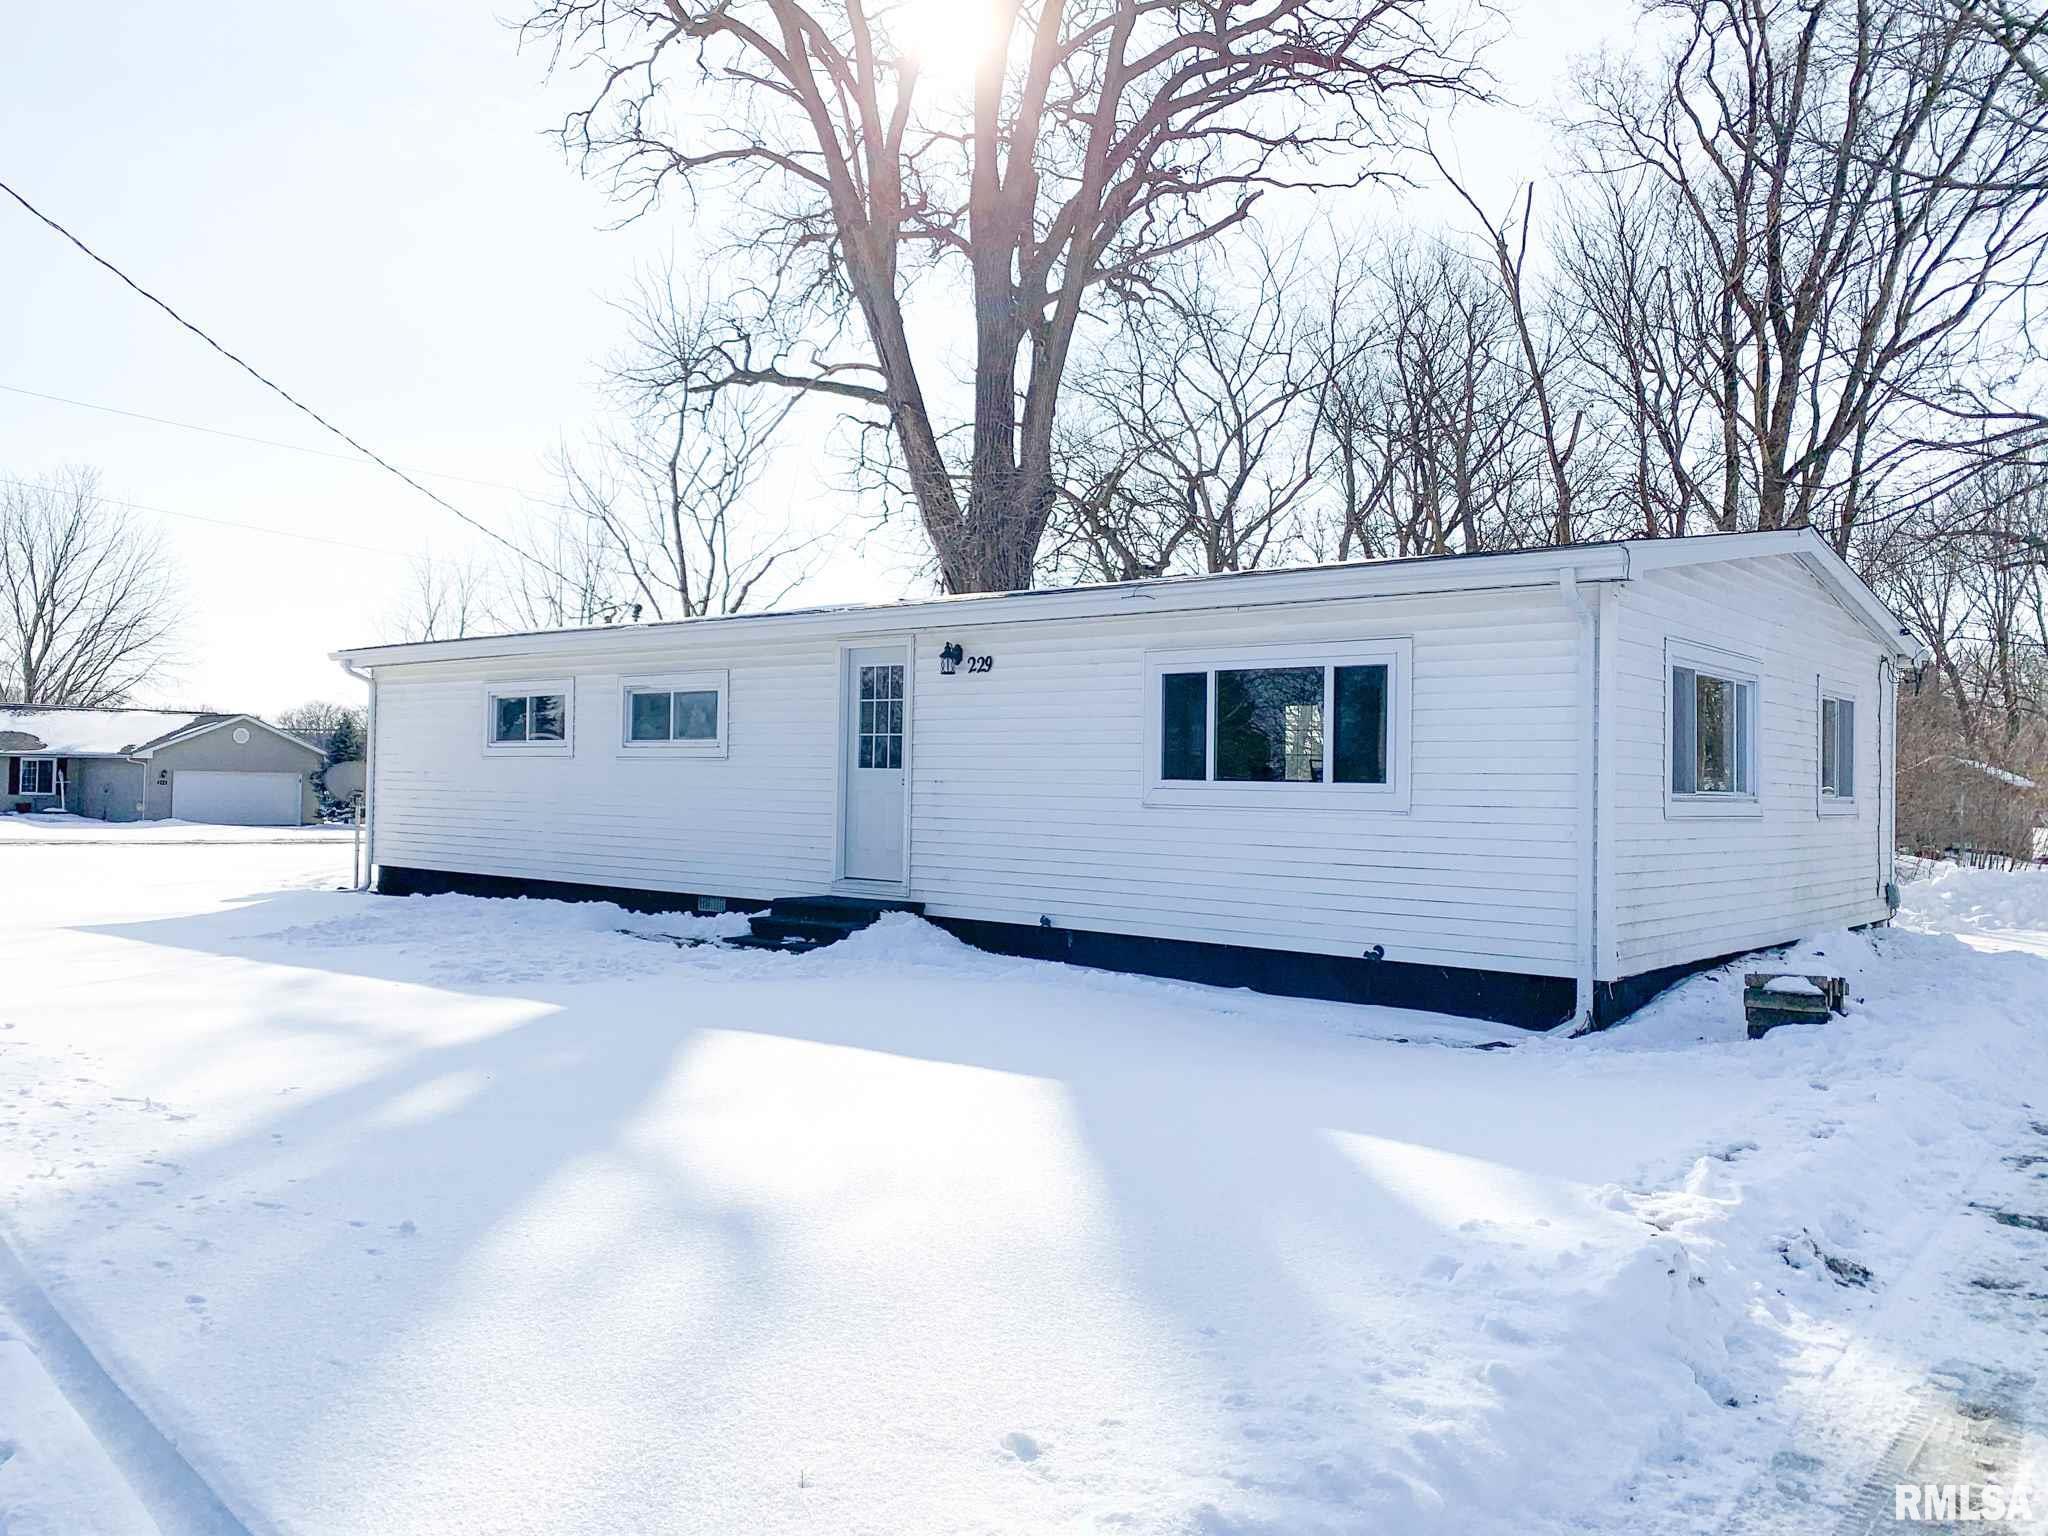 229 S WASHINGTON Property Photo - Brimfield, IL real estate listing